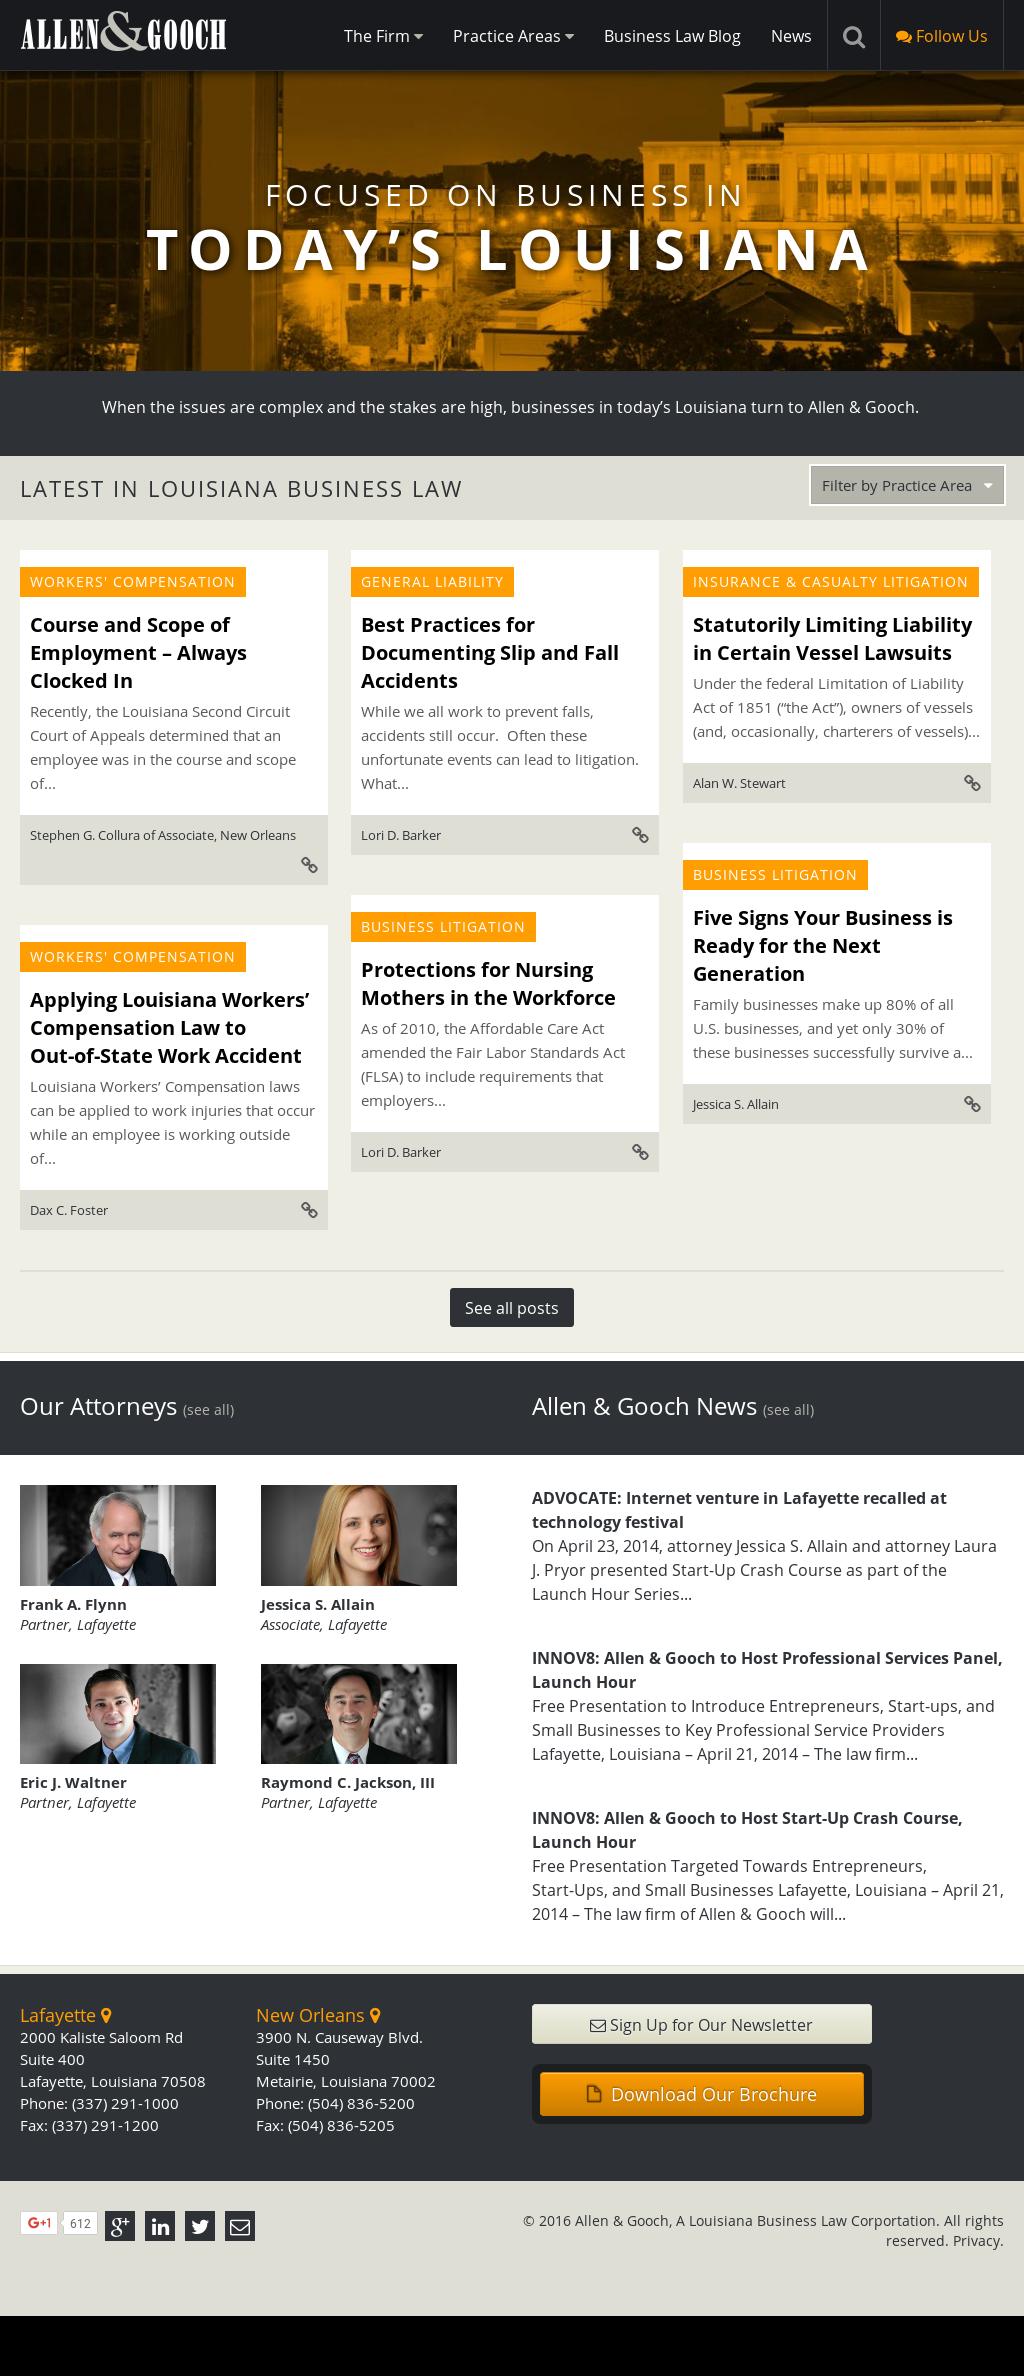 Allen & Gooch Competitors, Revenue and Employees - Owler Company Profile